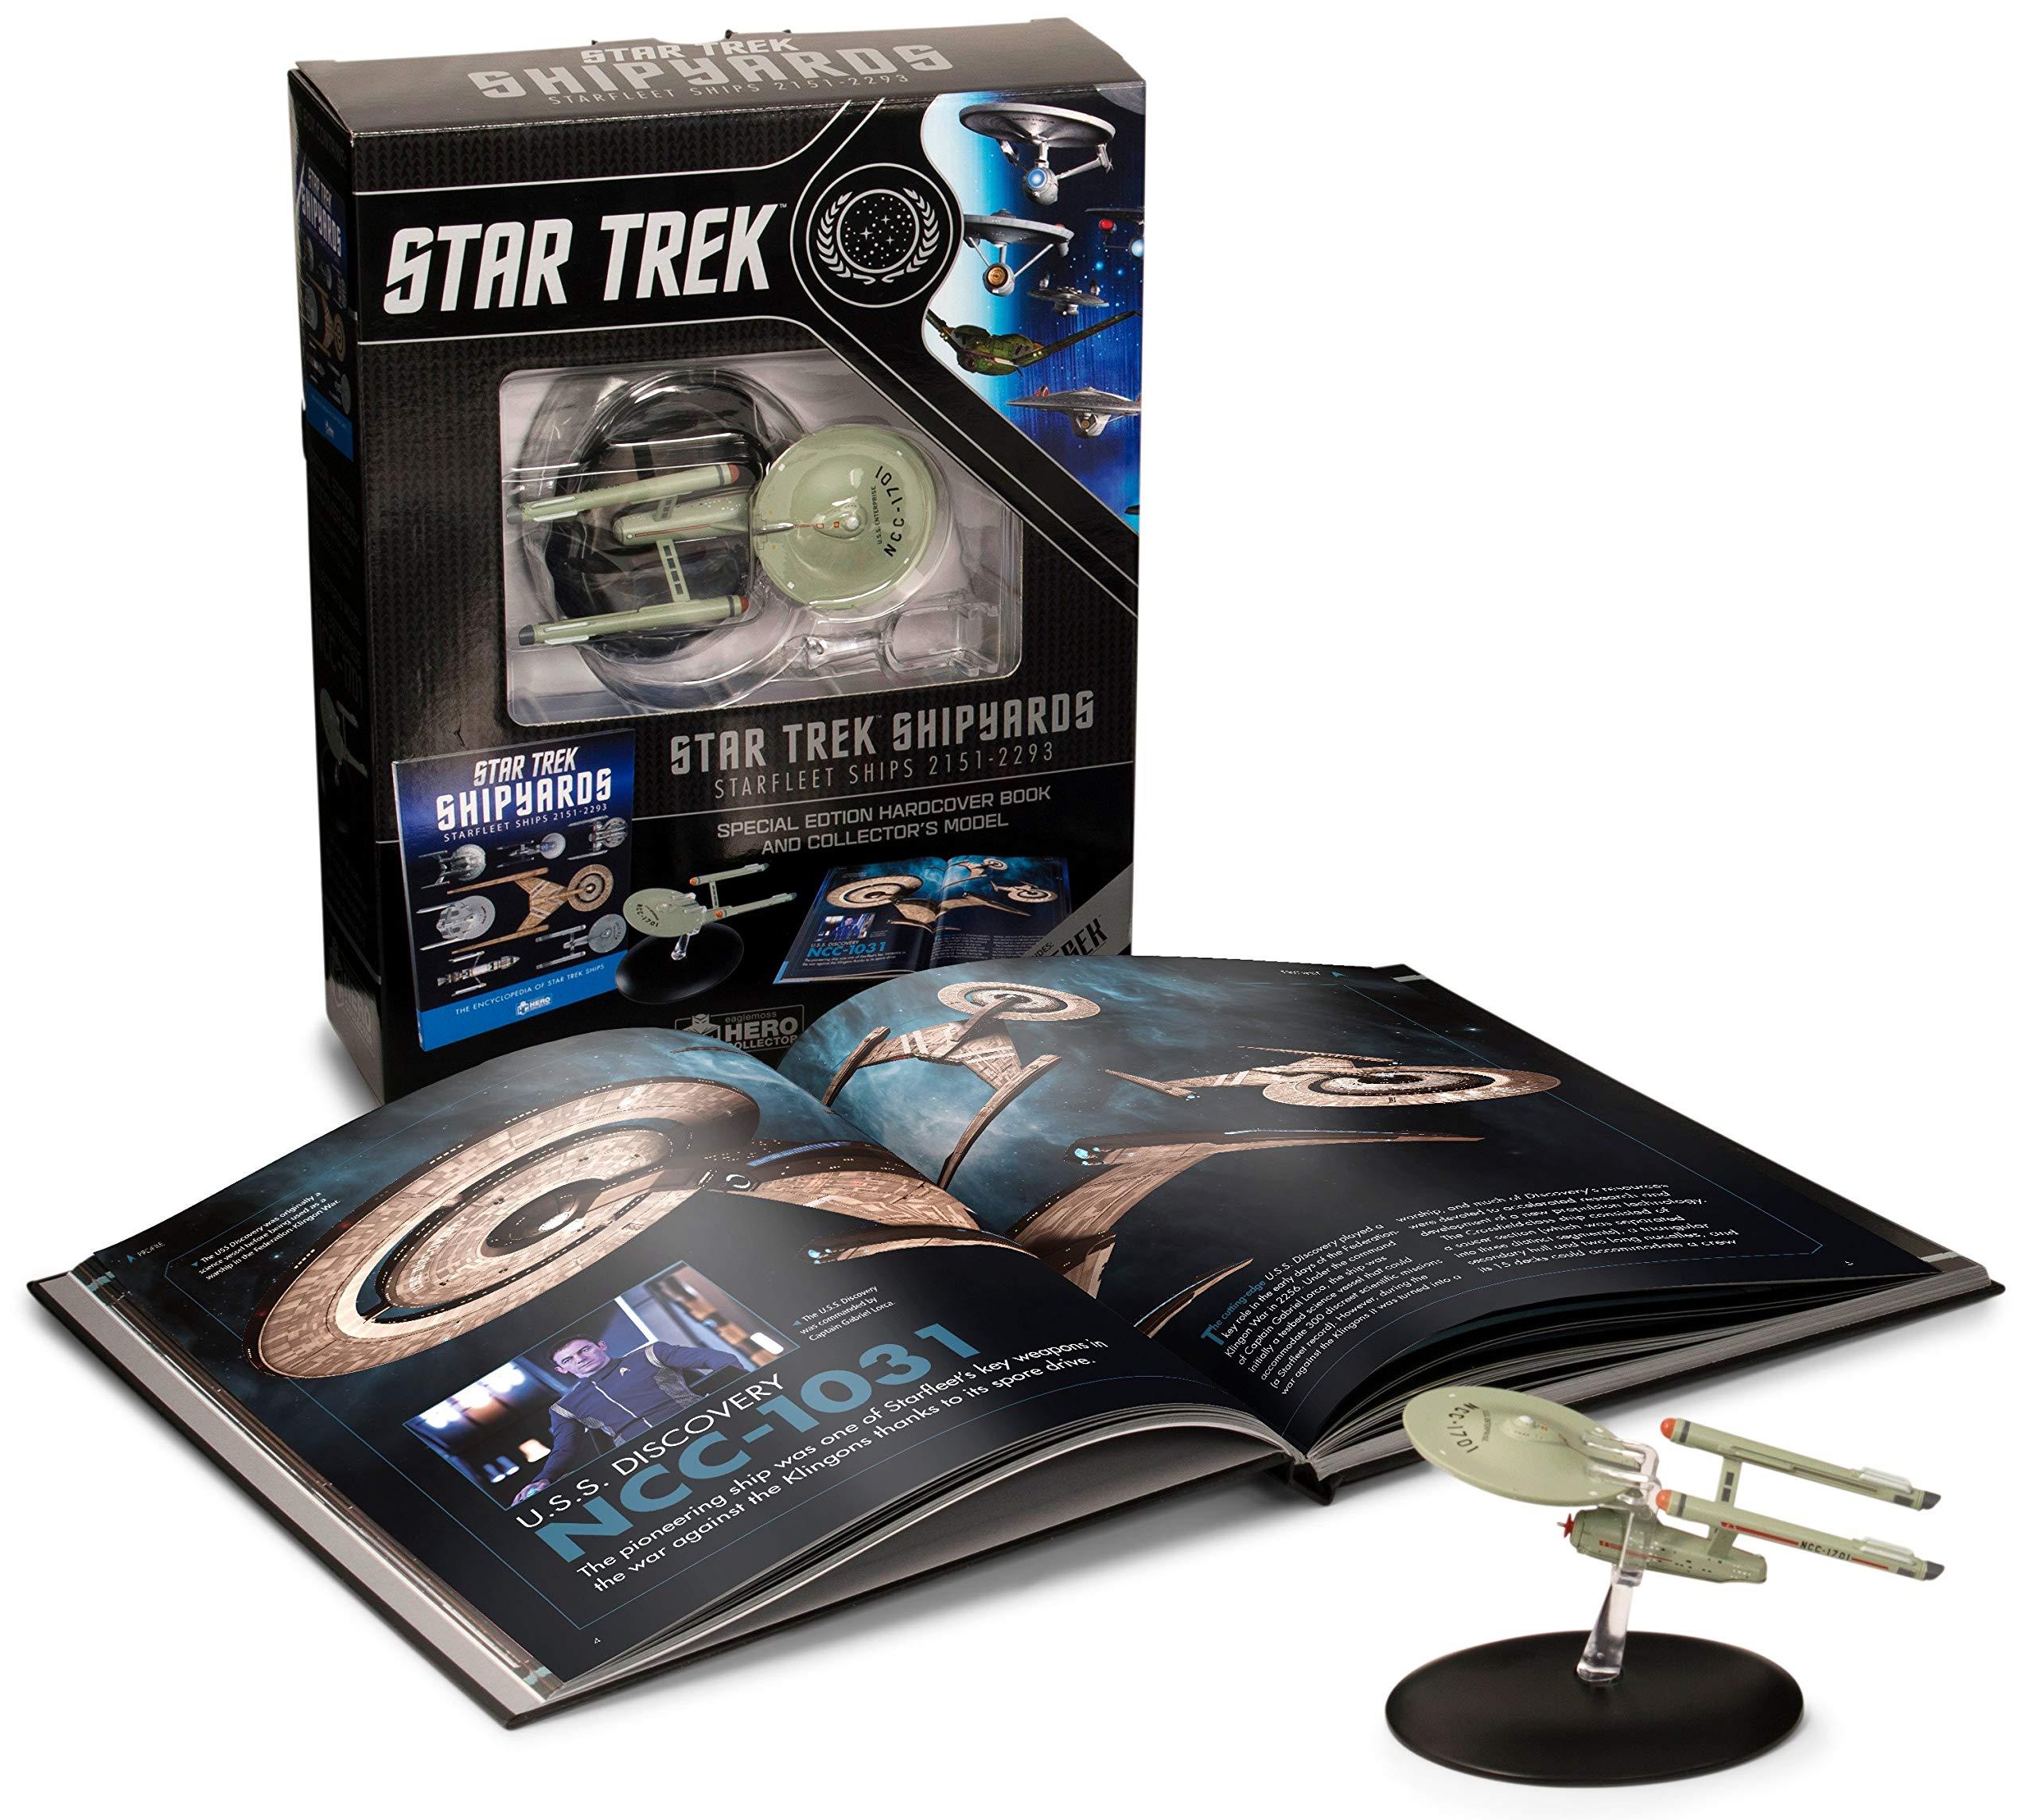 Amazon com: Star Trek Shipyards Star Trek Starships: 2151